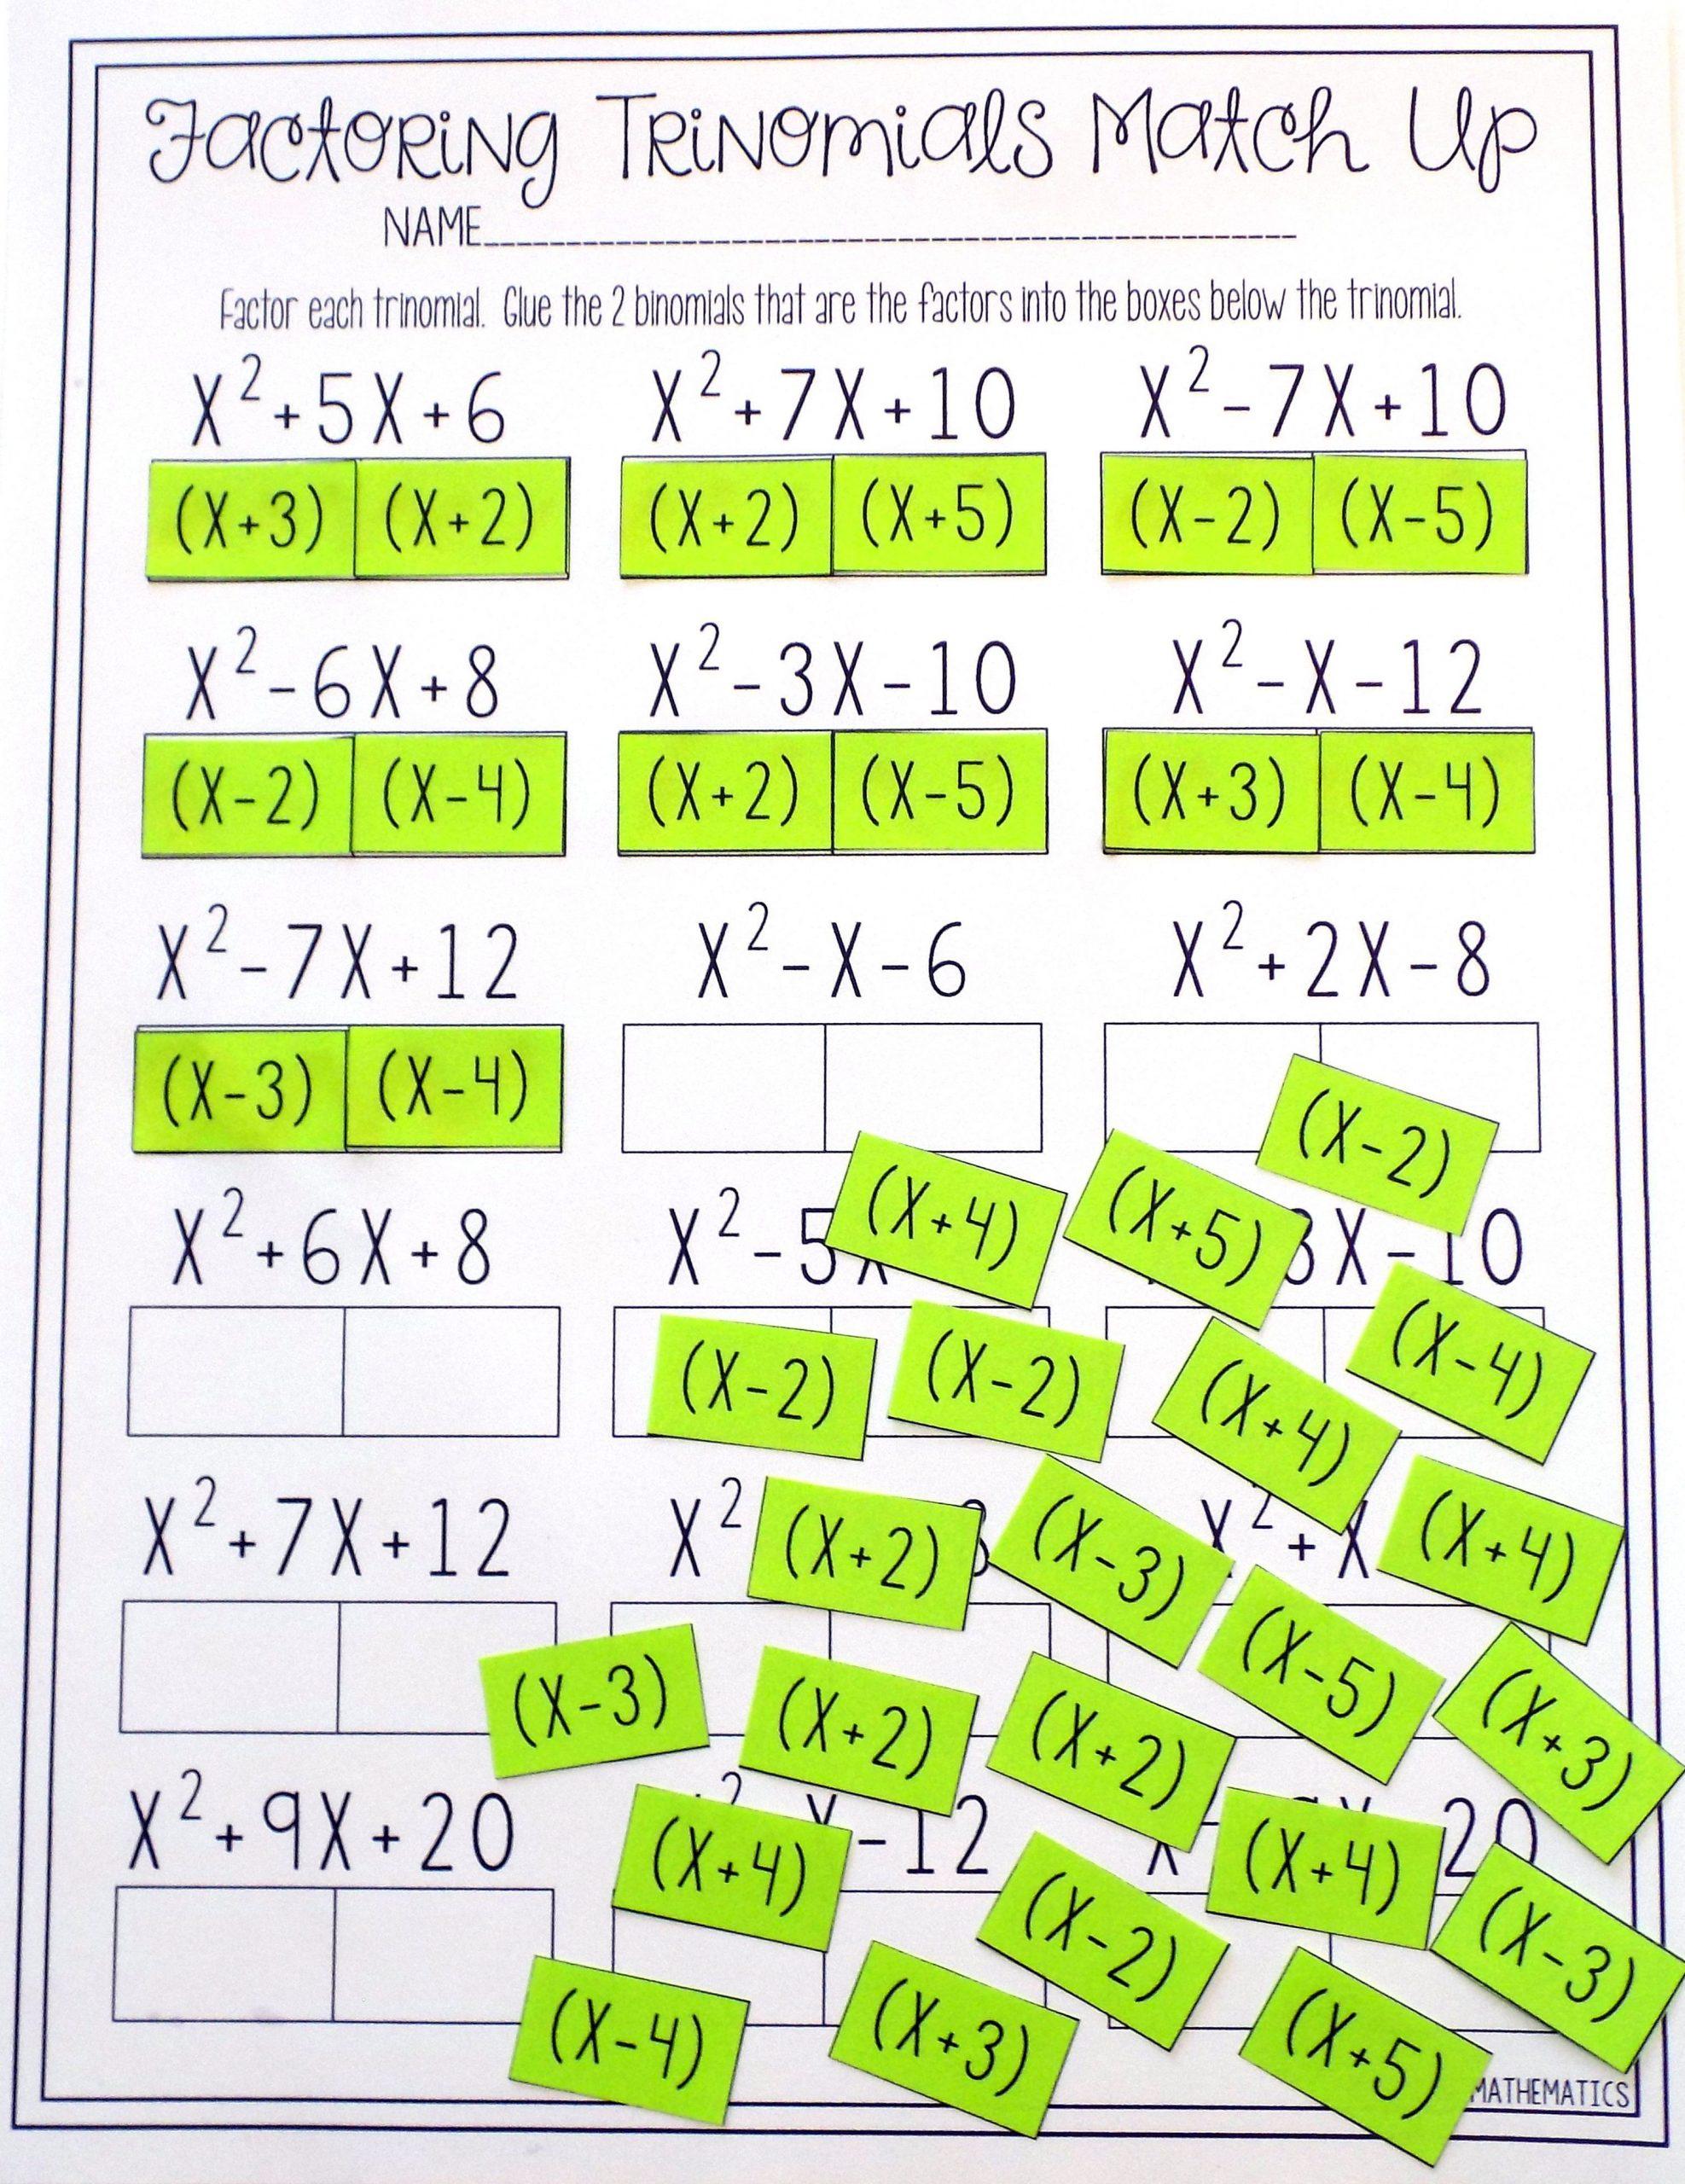 Factoring Trinomials Worksheet Answer Key Factoring Polynomials Trinomials Activity Beginner